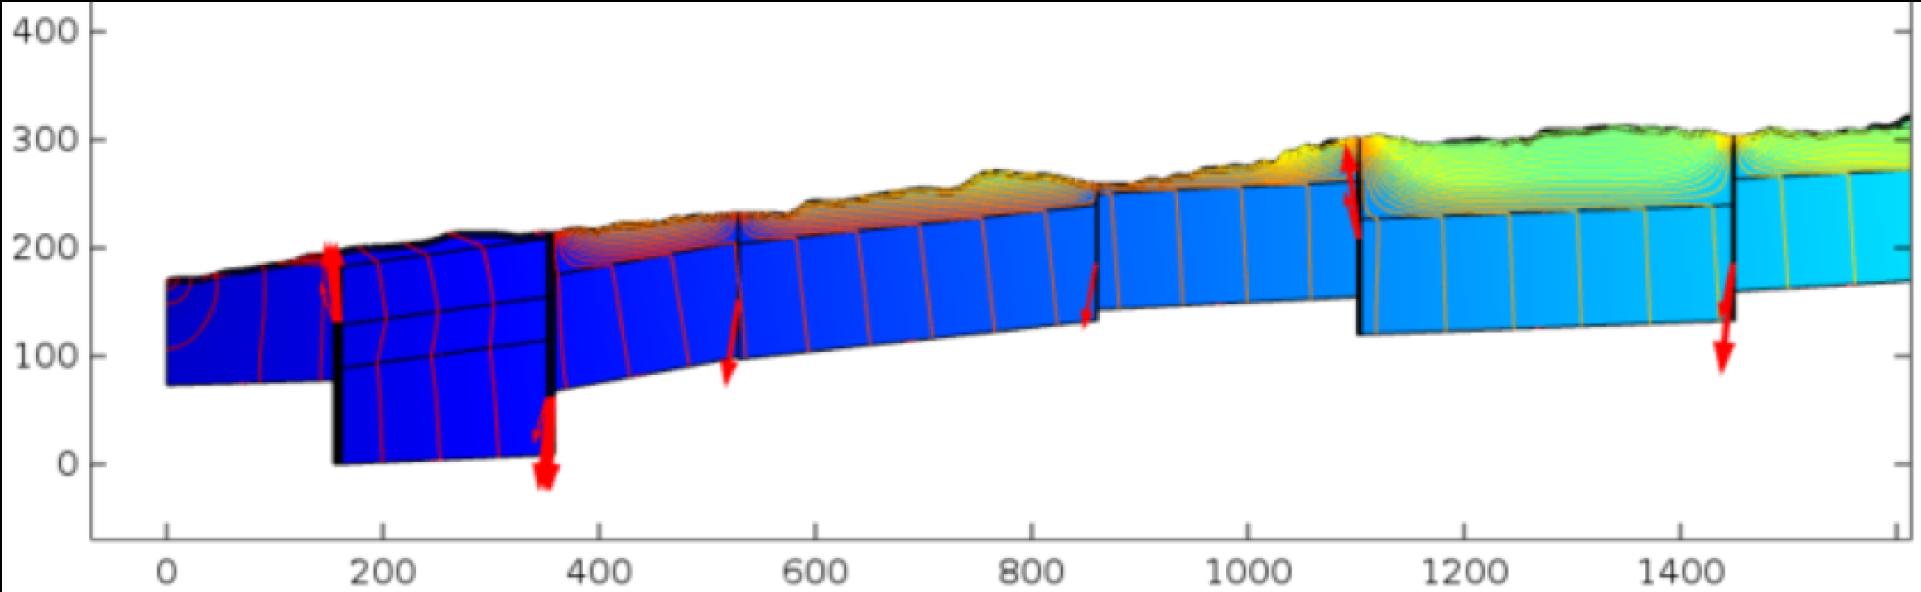 Discrete fault zone modeling of the Weendespring catchment, Goettingen